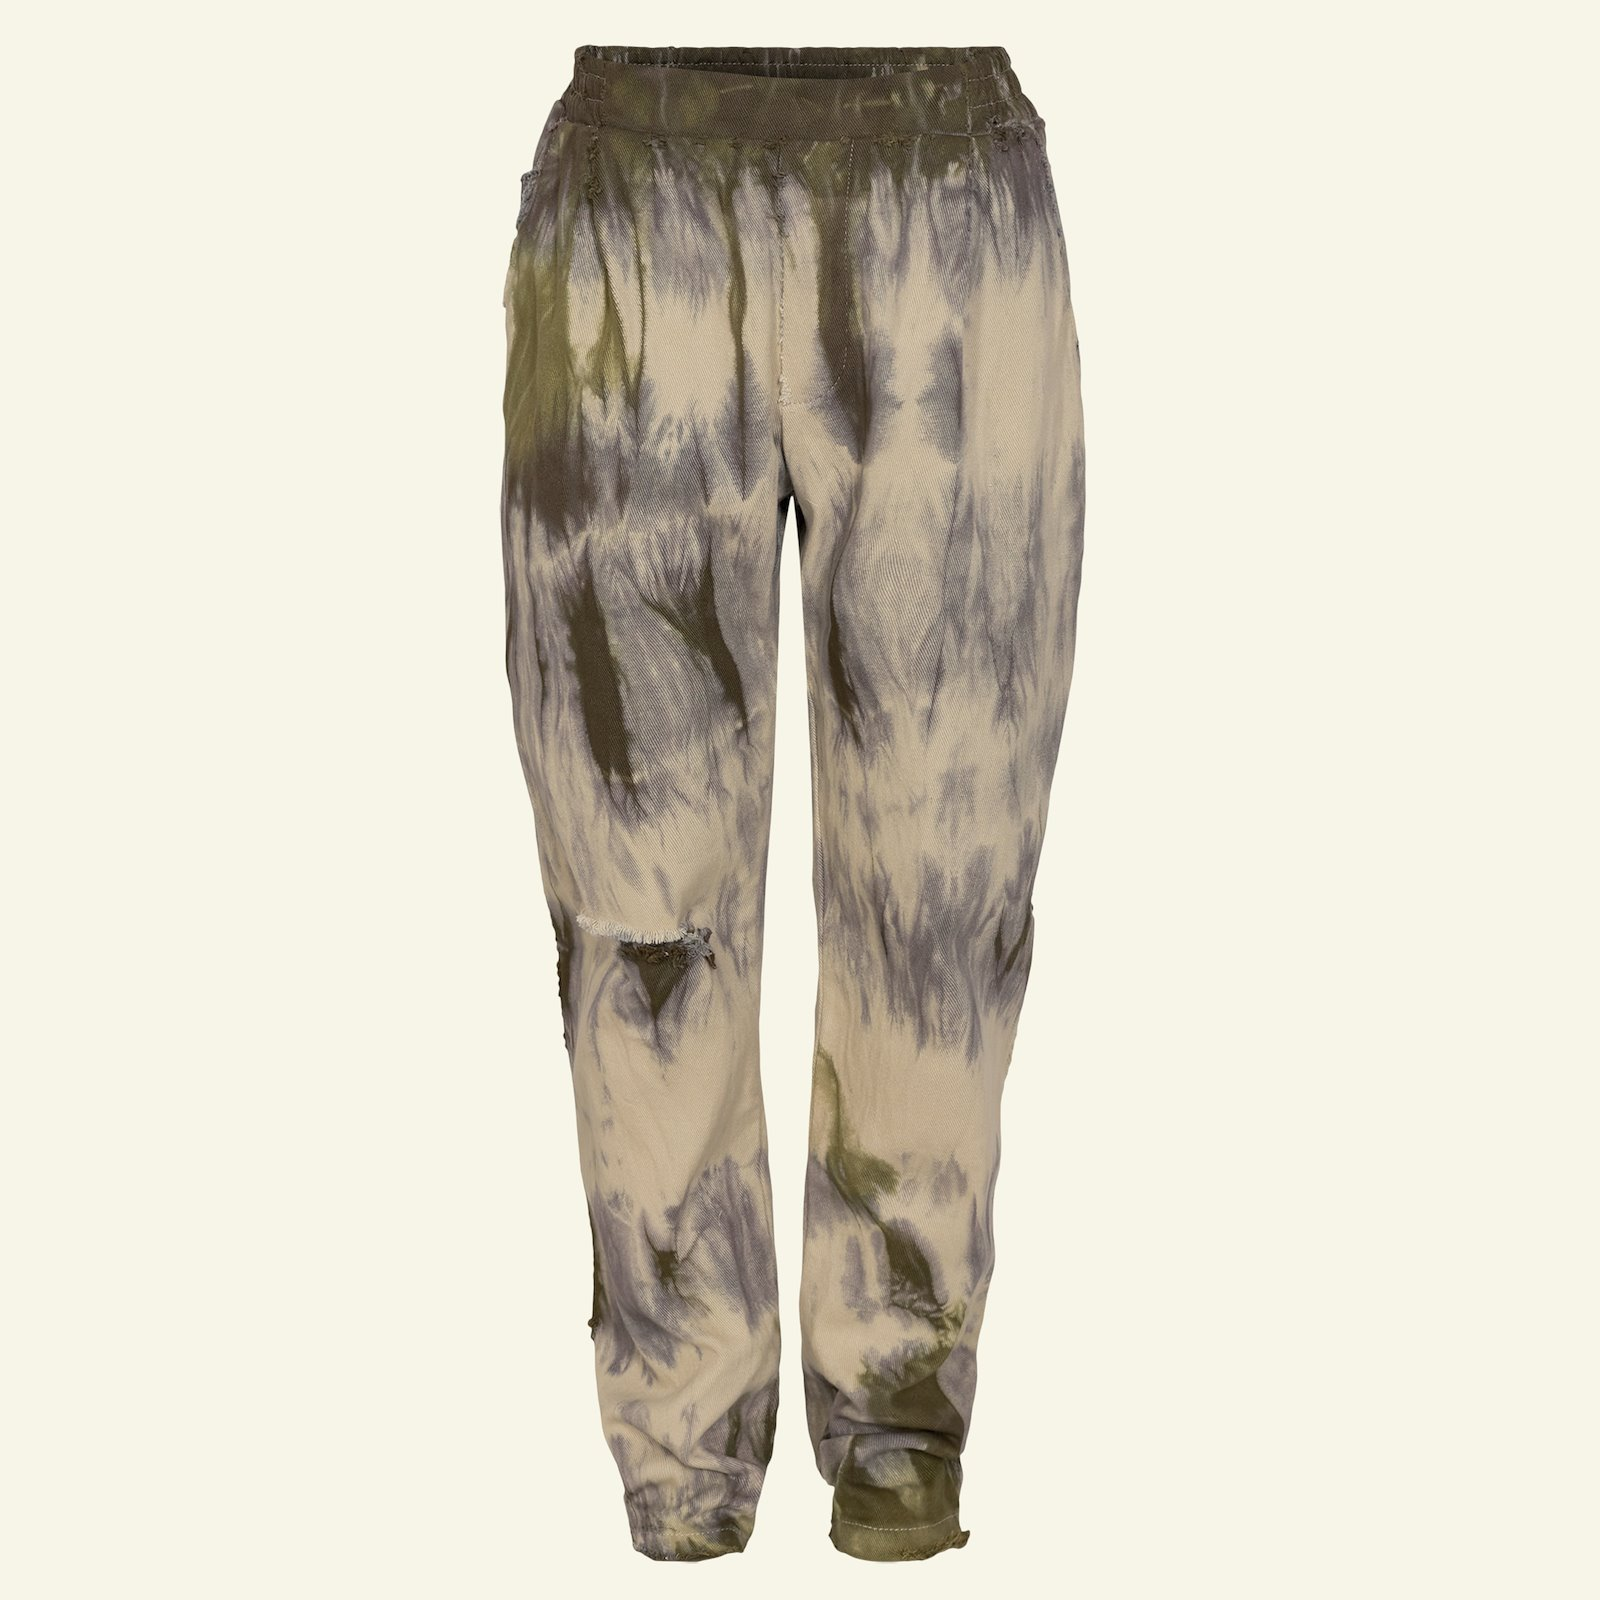 Chino pants, 98/3y p60033_460842_sskit